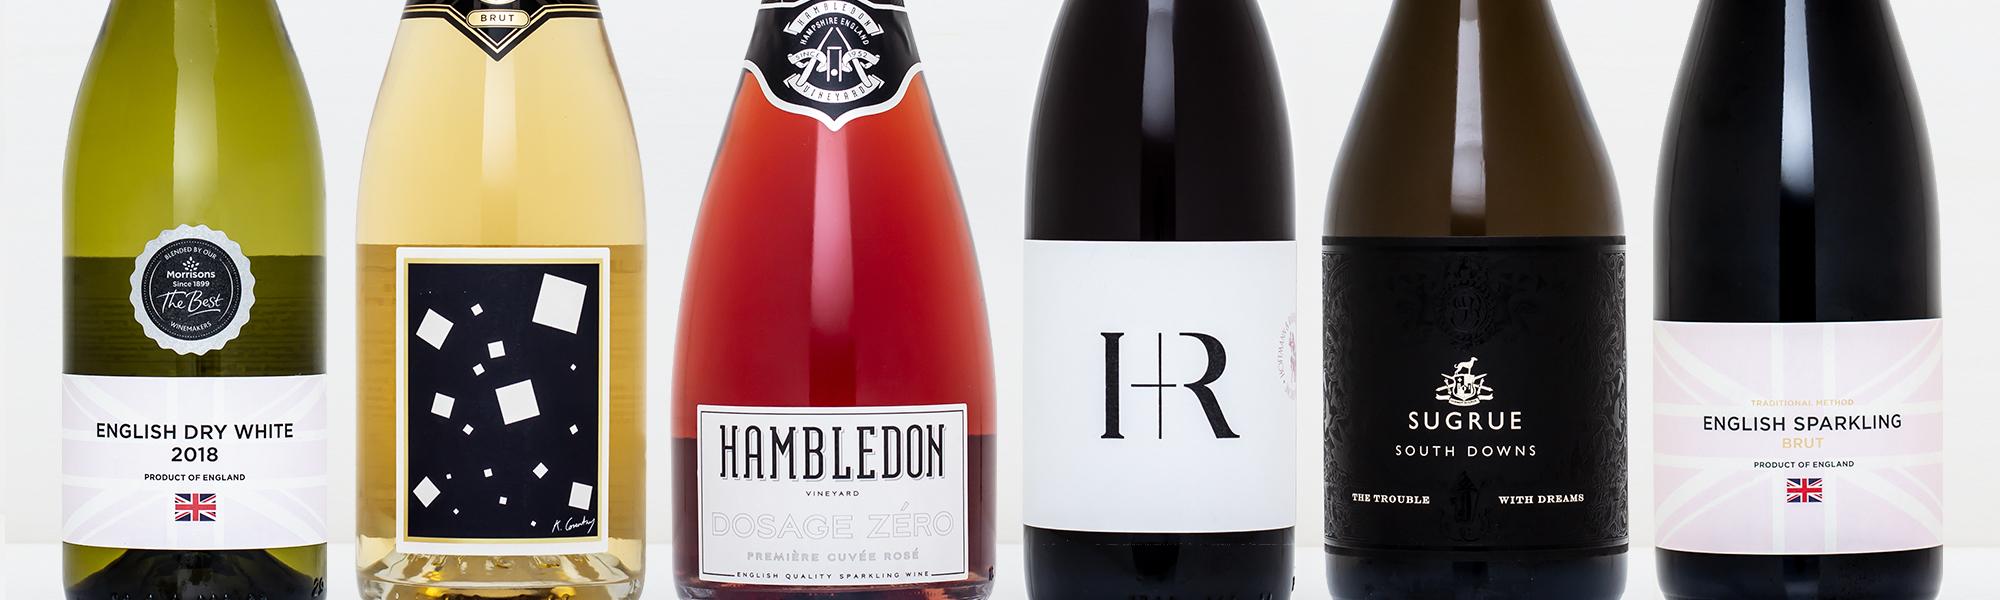 The Great British Wine October Round Up 2019 Great British Wine